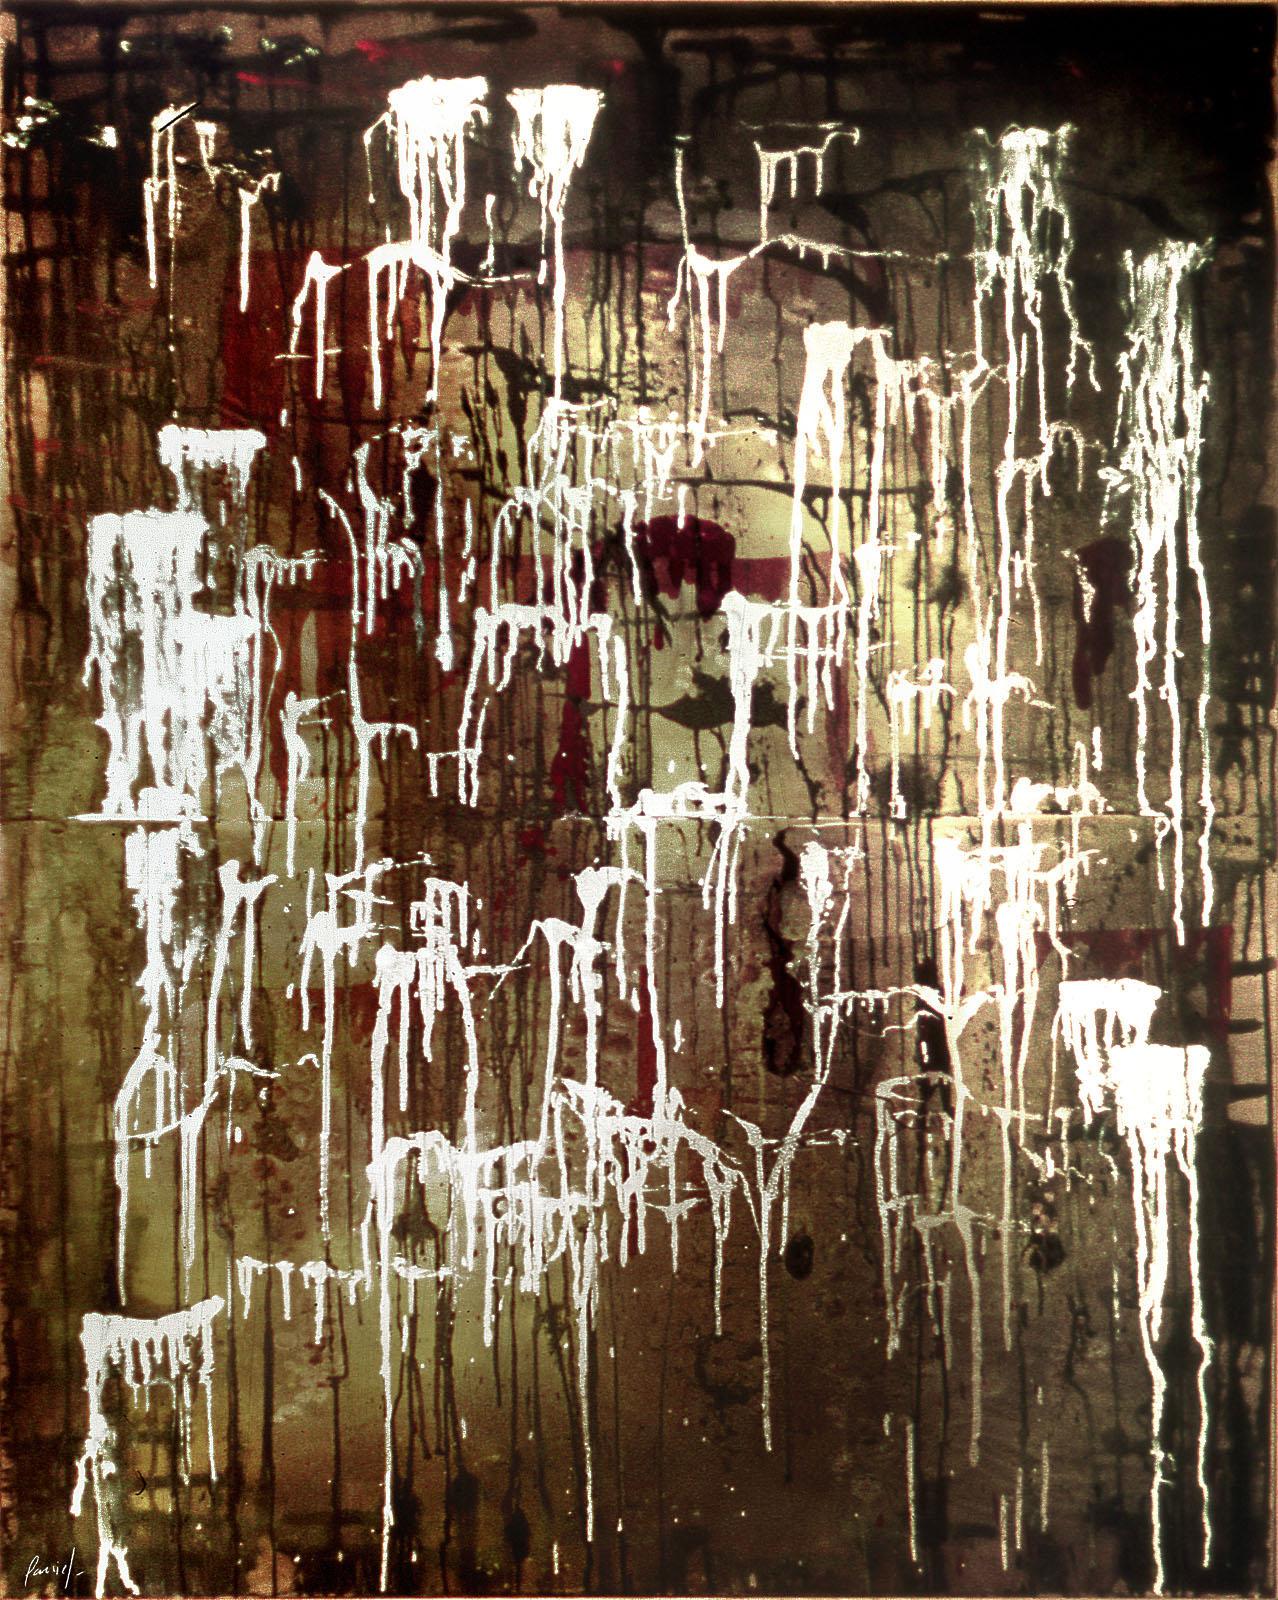 panies-danielvillalobos-spanish-painting-abstractexpressionism-7